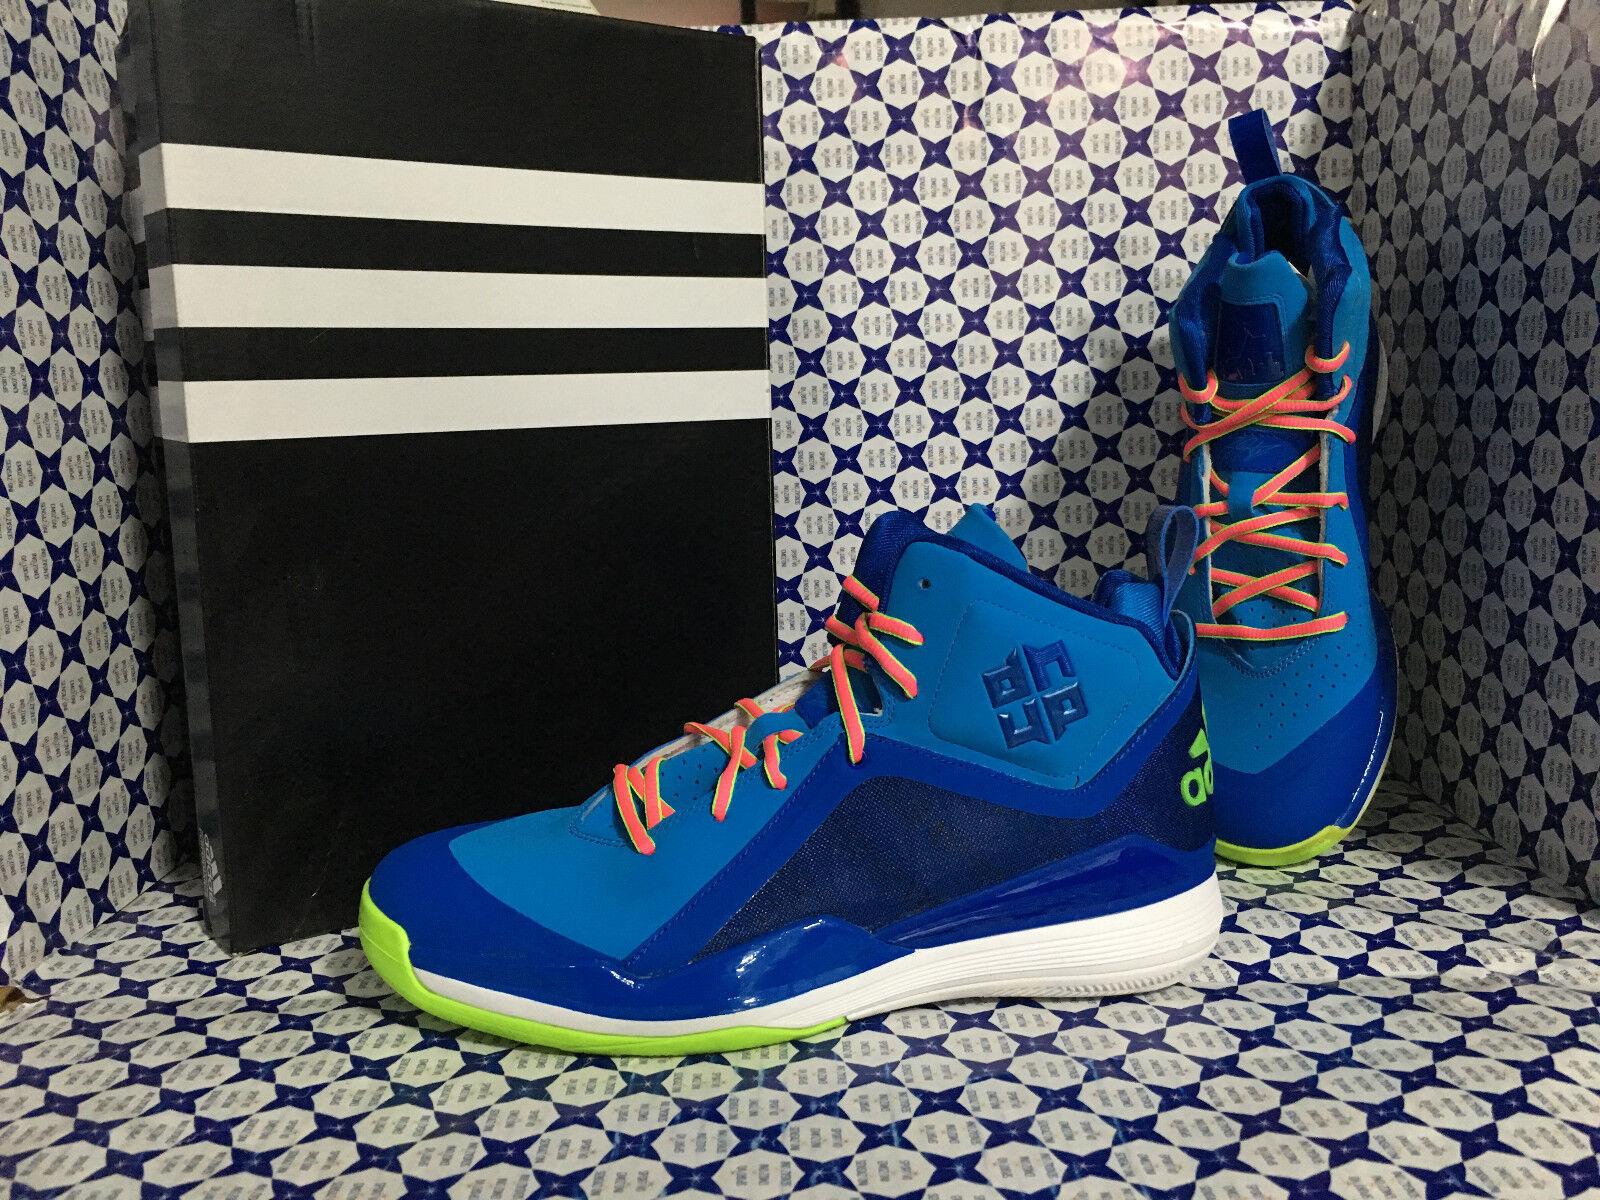 Scarpe Adidas Basket Uomo - D Howard 5 SCONTATE - Azzurro Verde - D73948 Scarpe classiche da uomo